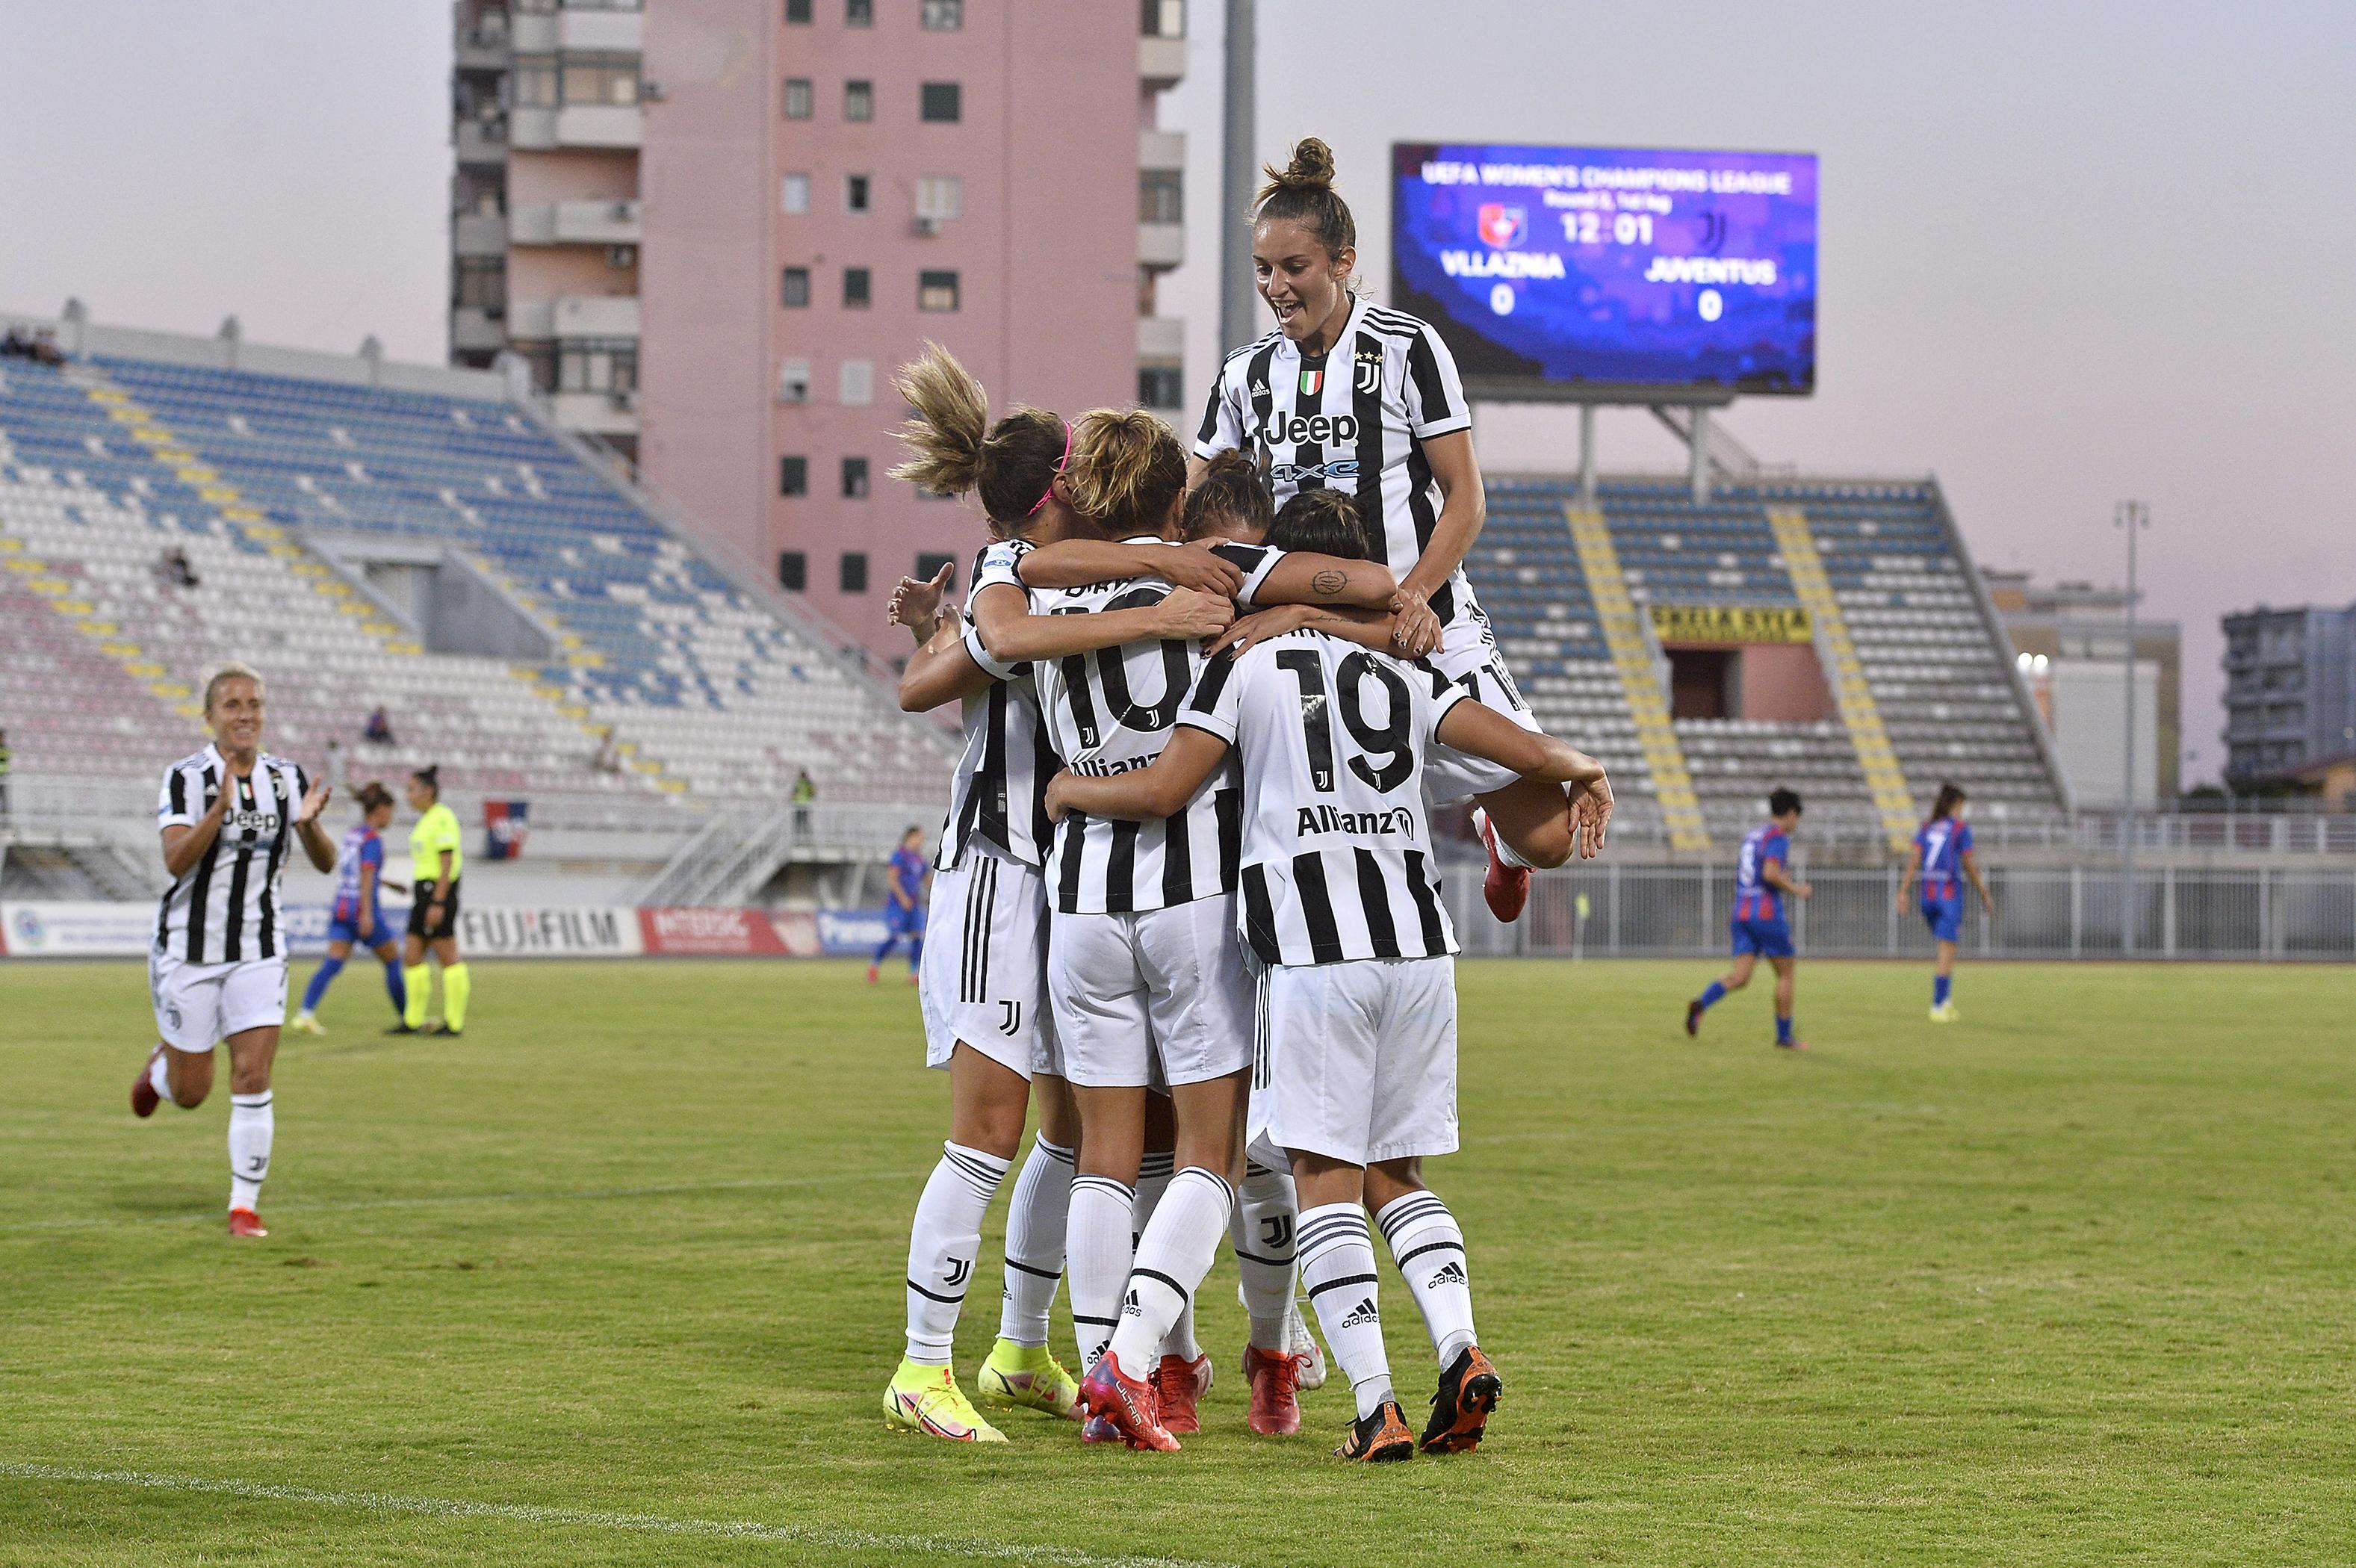 Vllaznia v Juventus Women - UEFA Women's Champions League